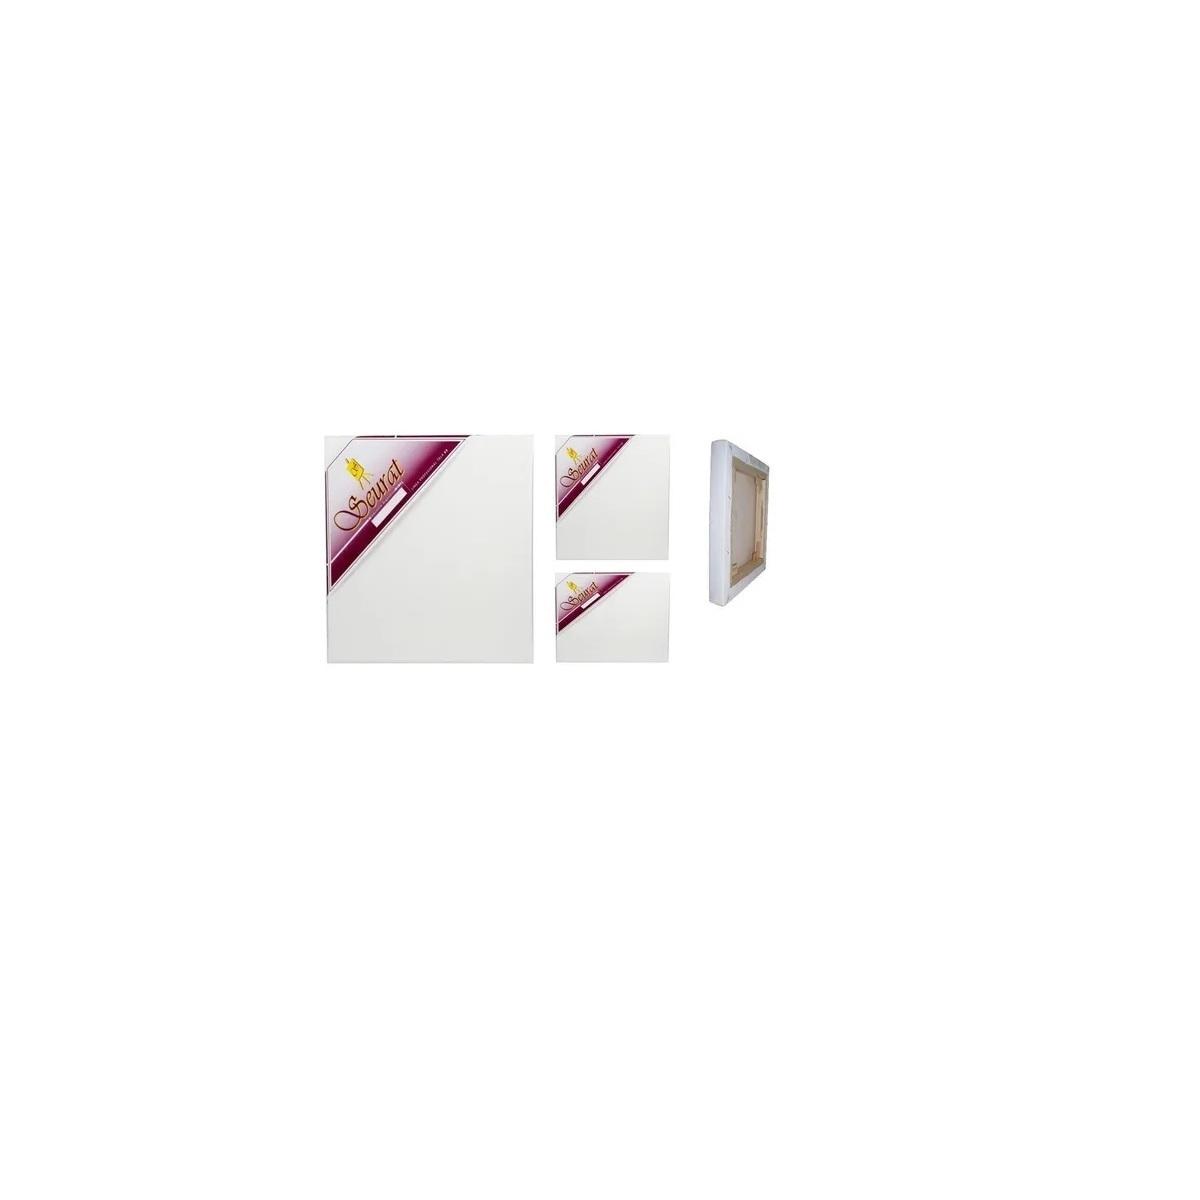 322020 SEURAT                                                       | BASTIDOR 20 X 20 CM TELA ESTUDIO GRANO FINO M-2 (2,5X3,5 CM)